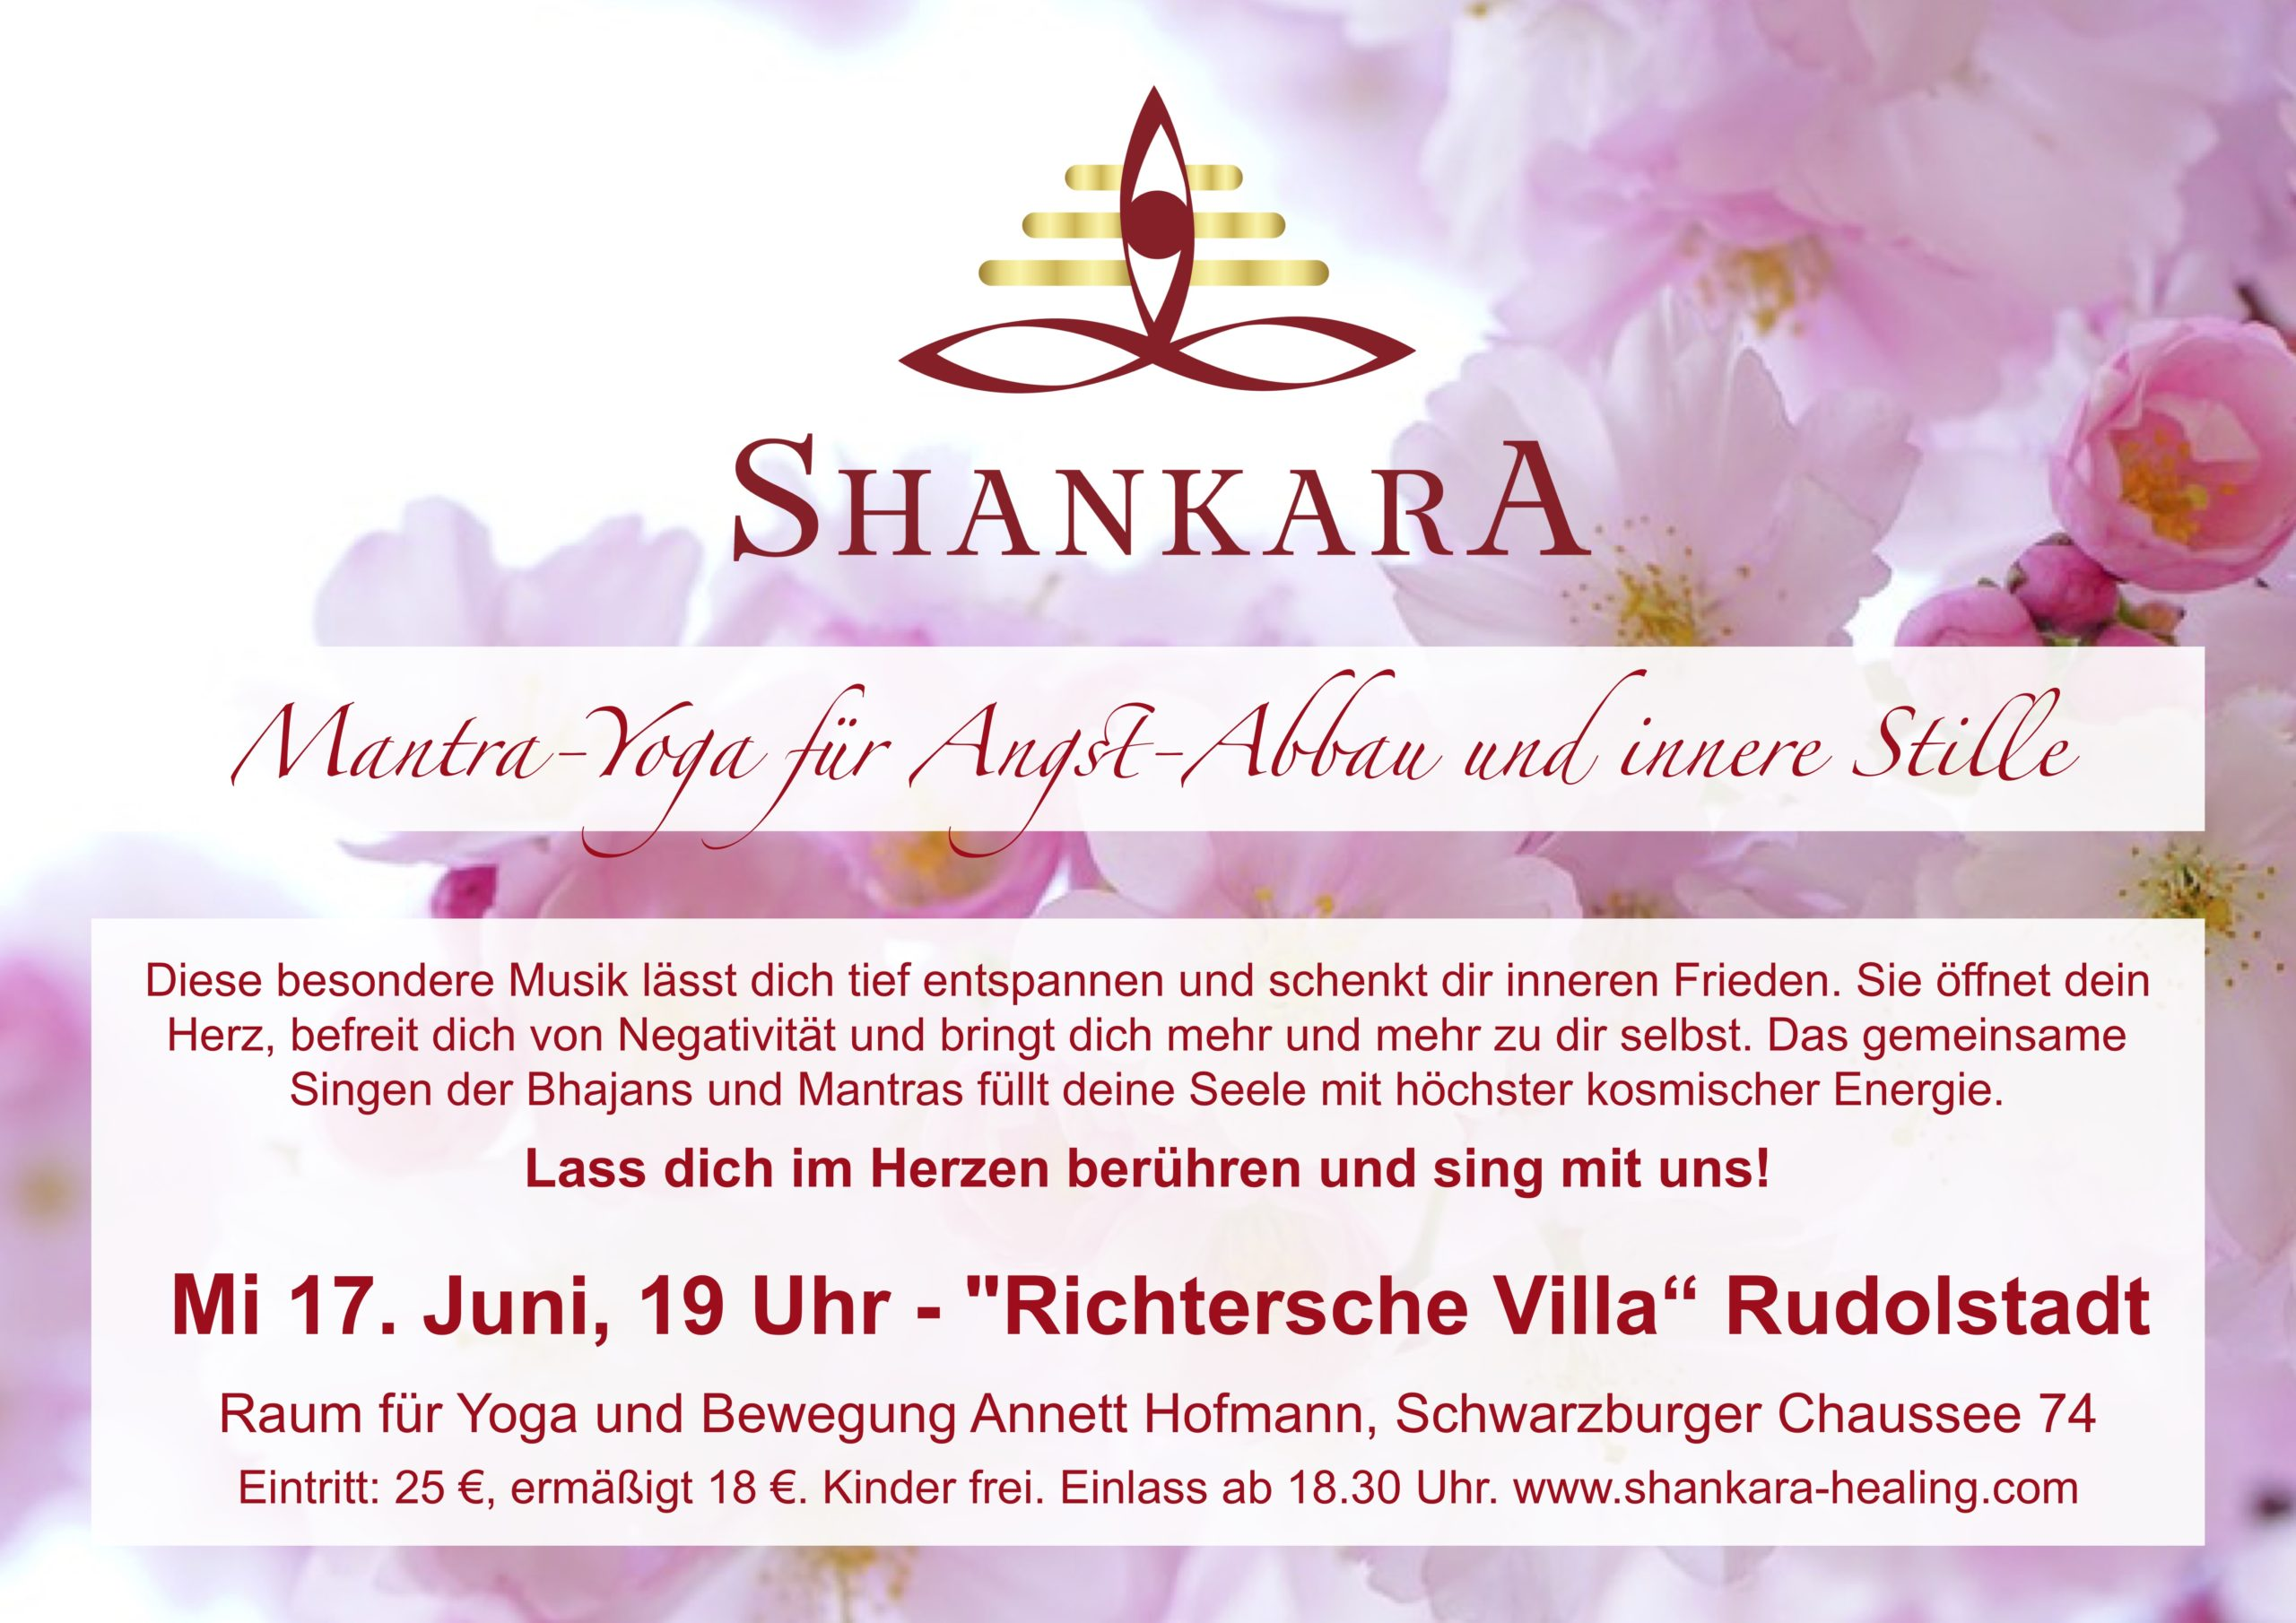 Mantra-Yoga mit Shankara in Rudolstadt